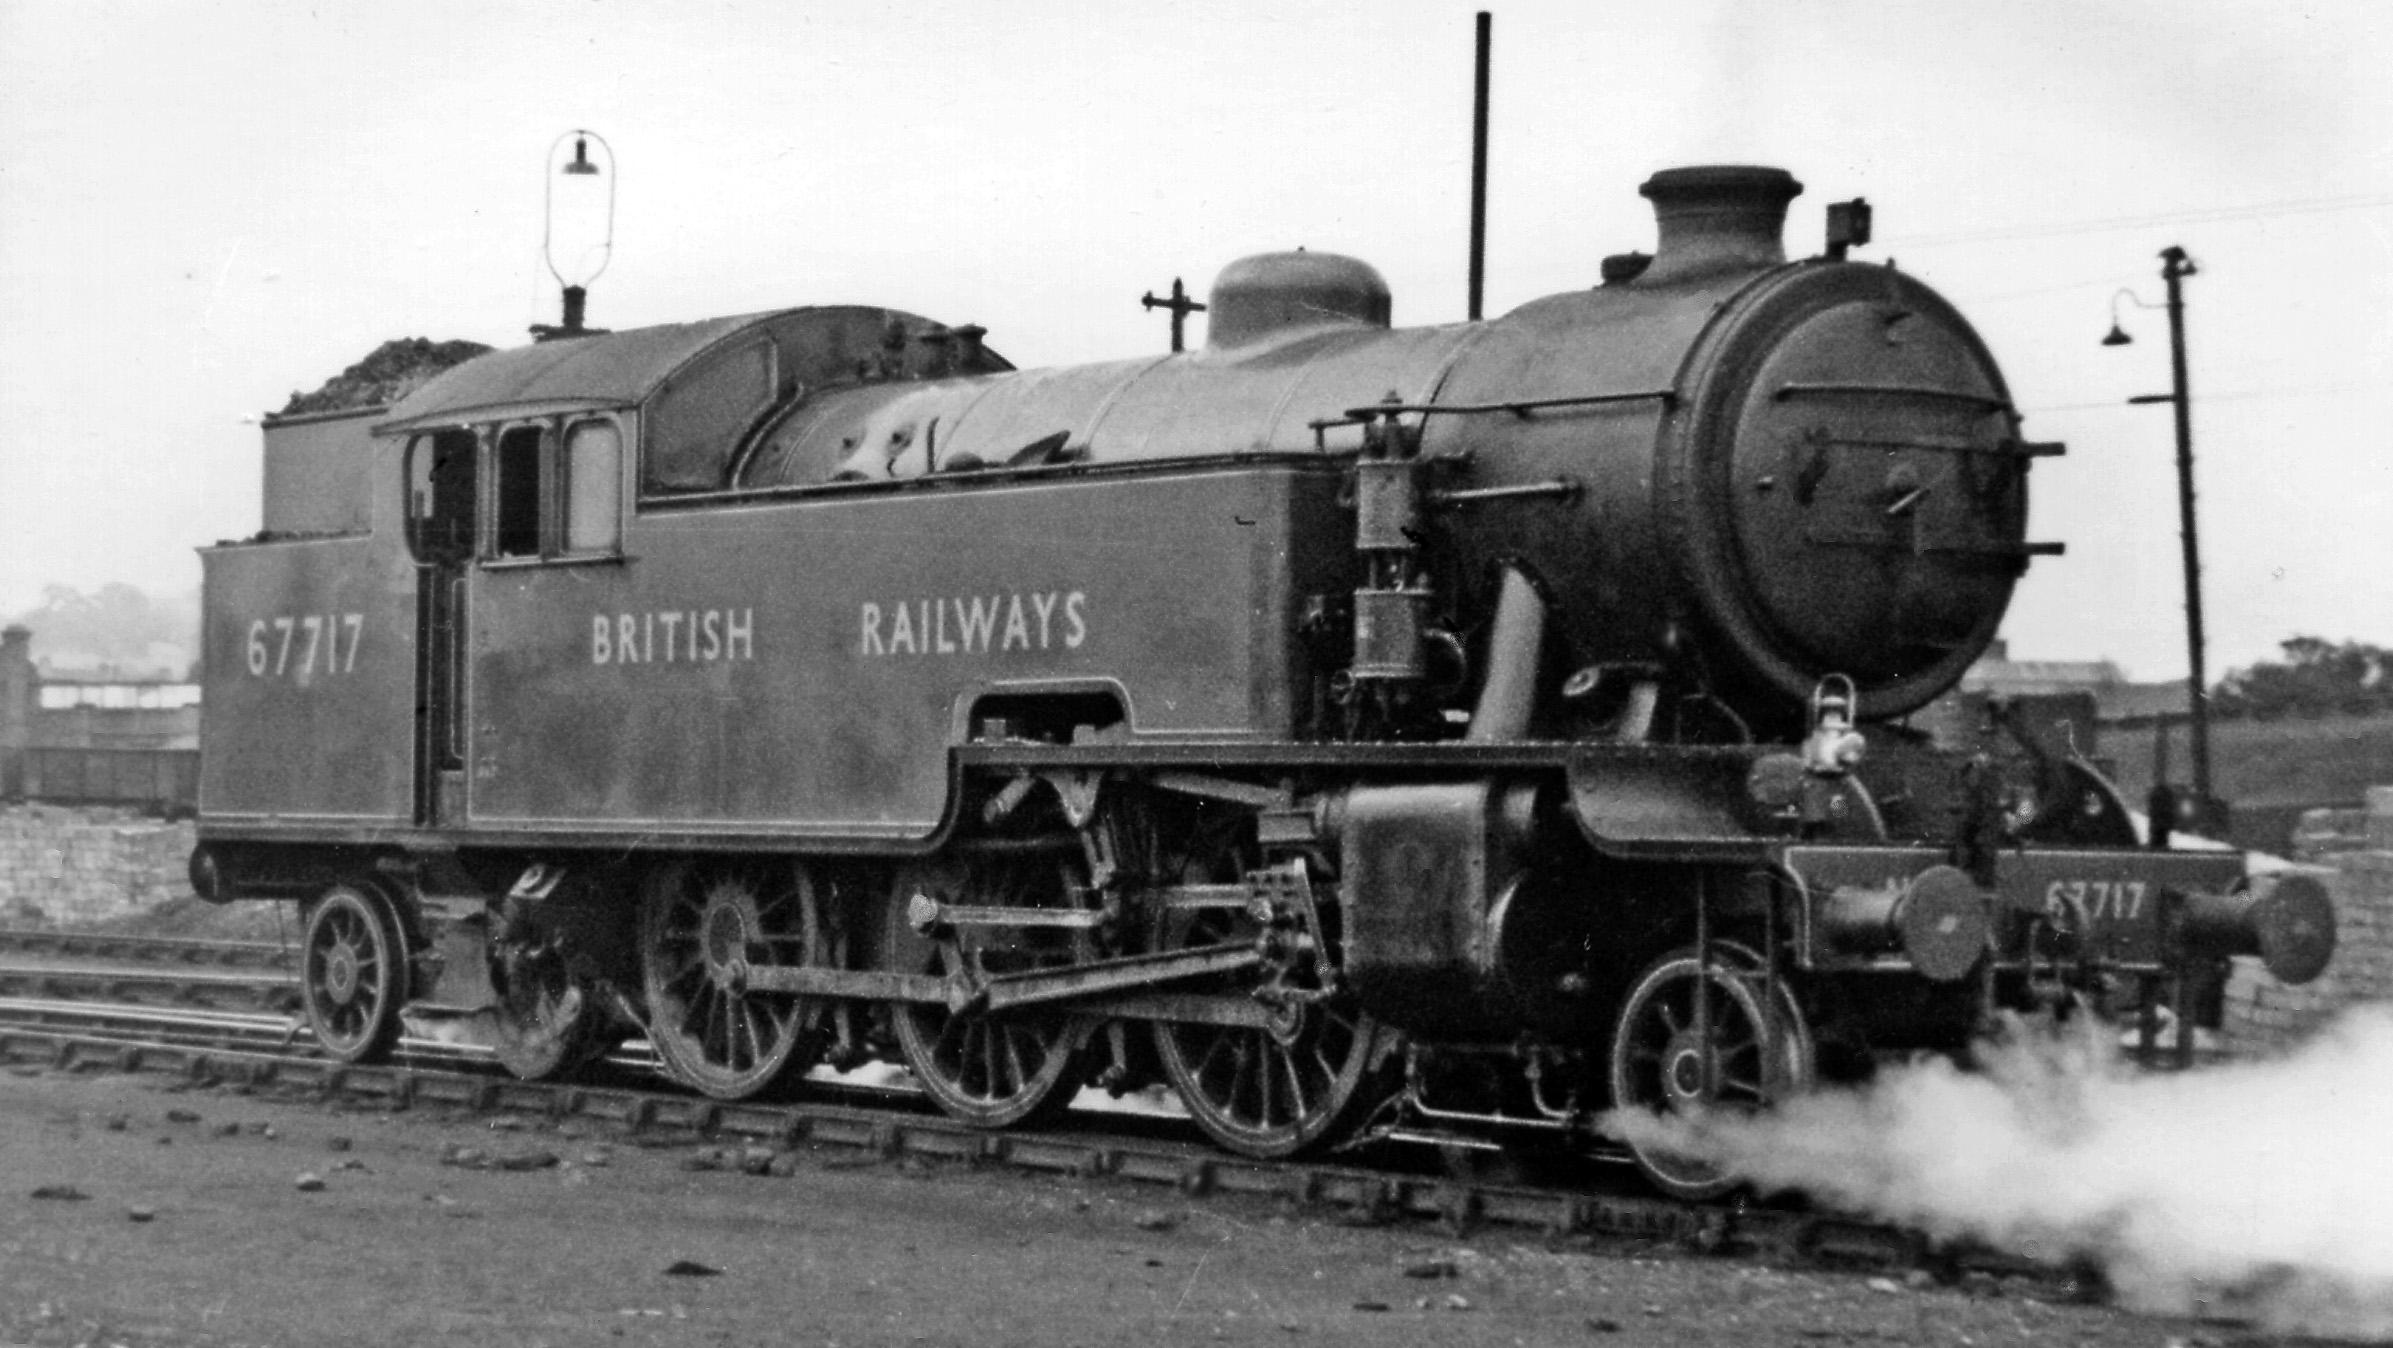 67717 at Neasden Locomotive Depot in July 1948. ©Ben Brooksbank